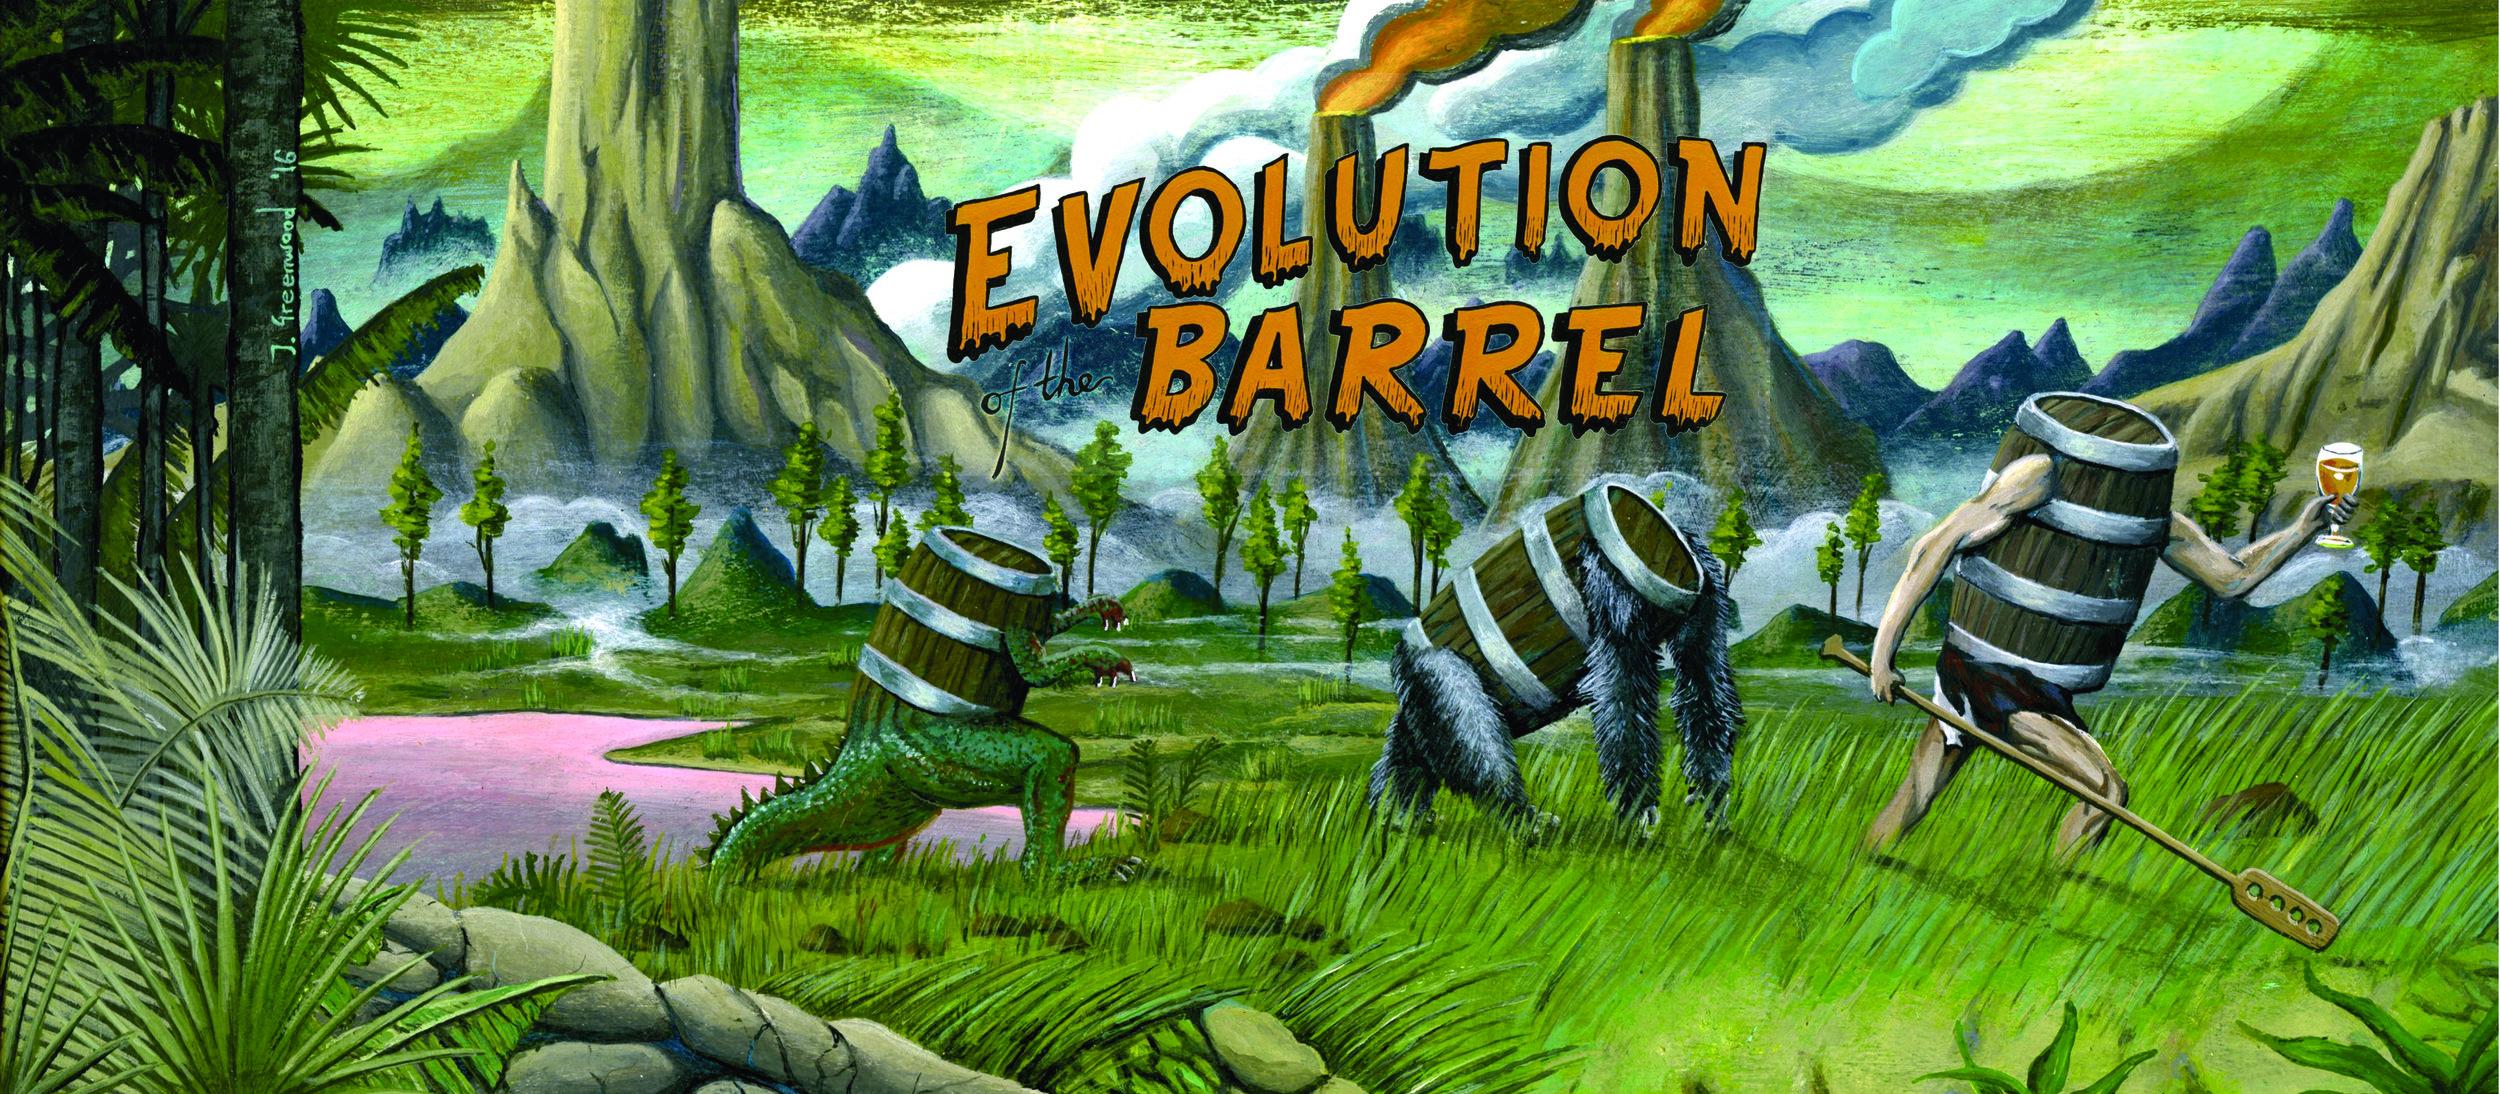 Evolution of the Barrel.jpg